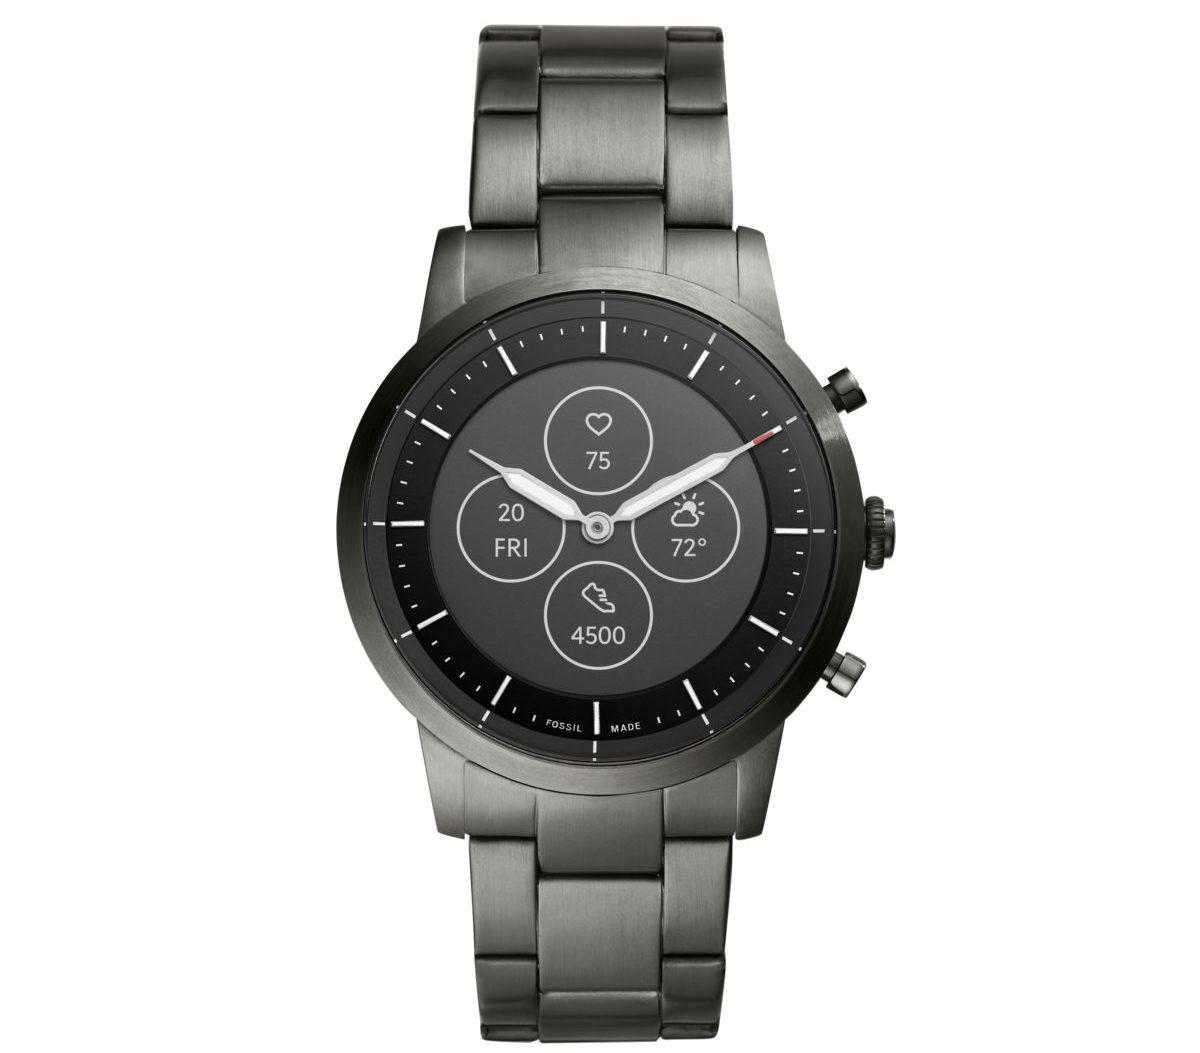 Arriva Fossil Hybrid HR l'orologio dall'anima smart